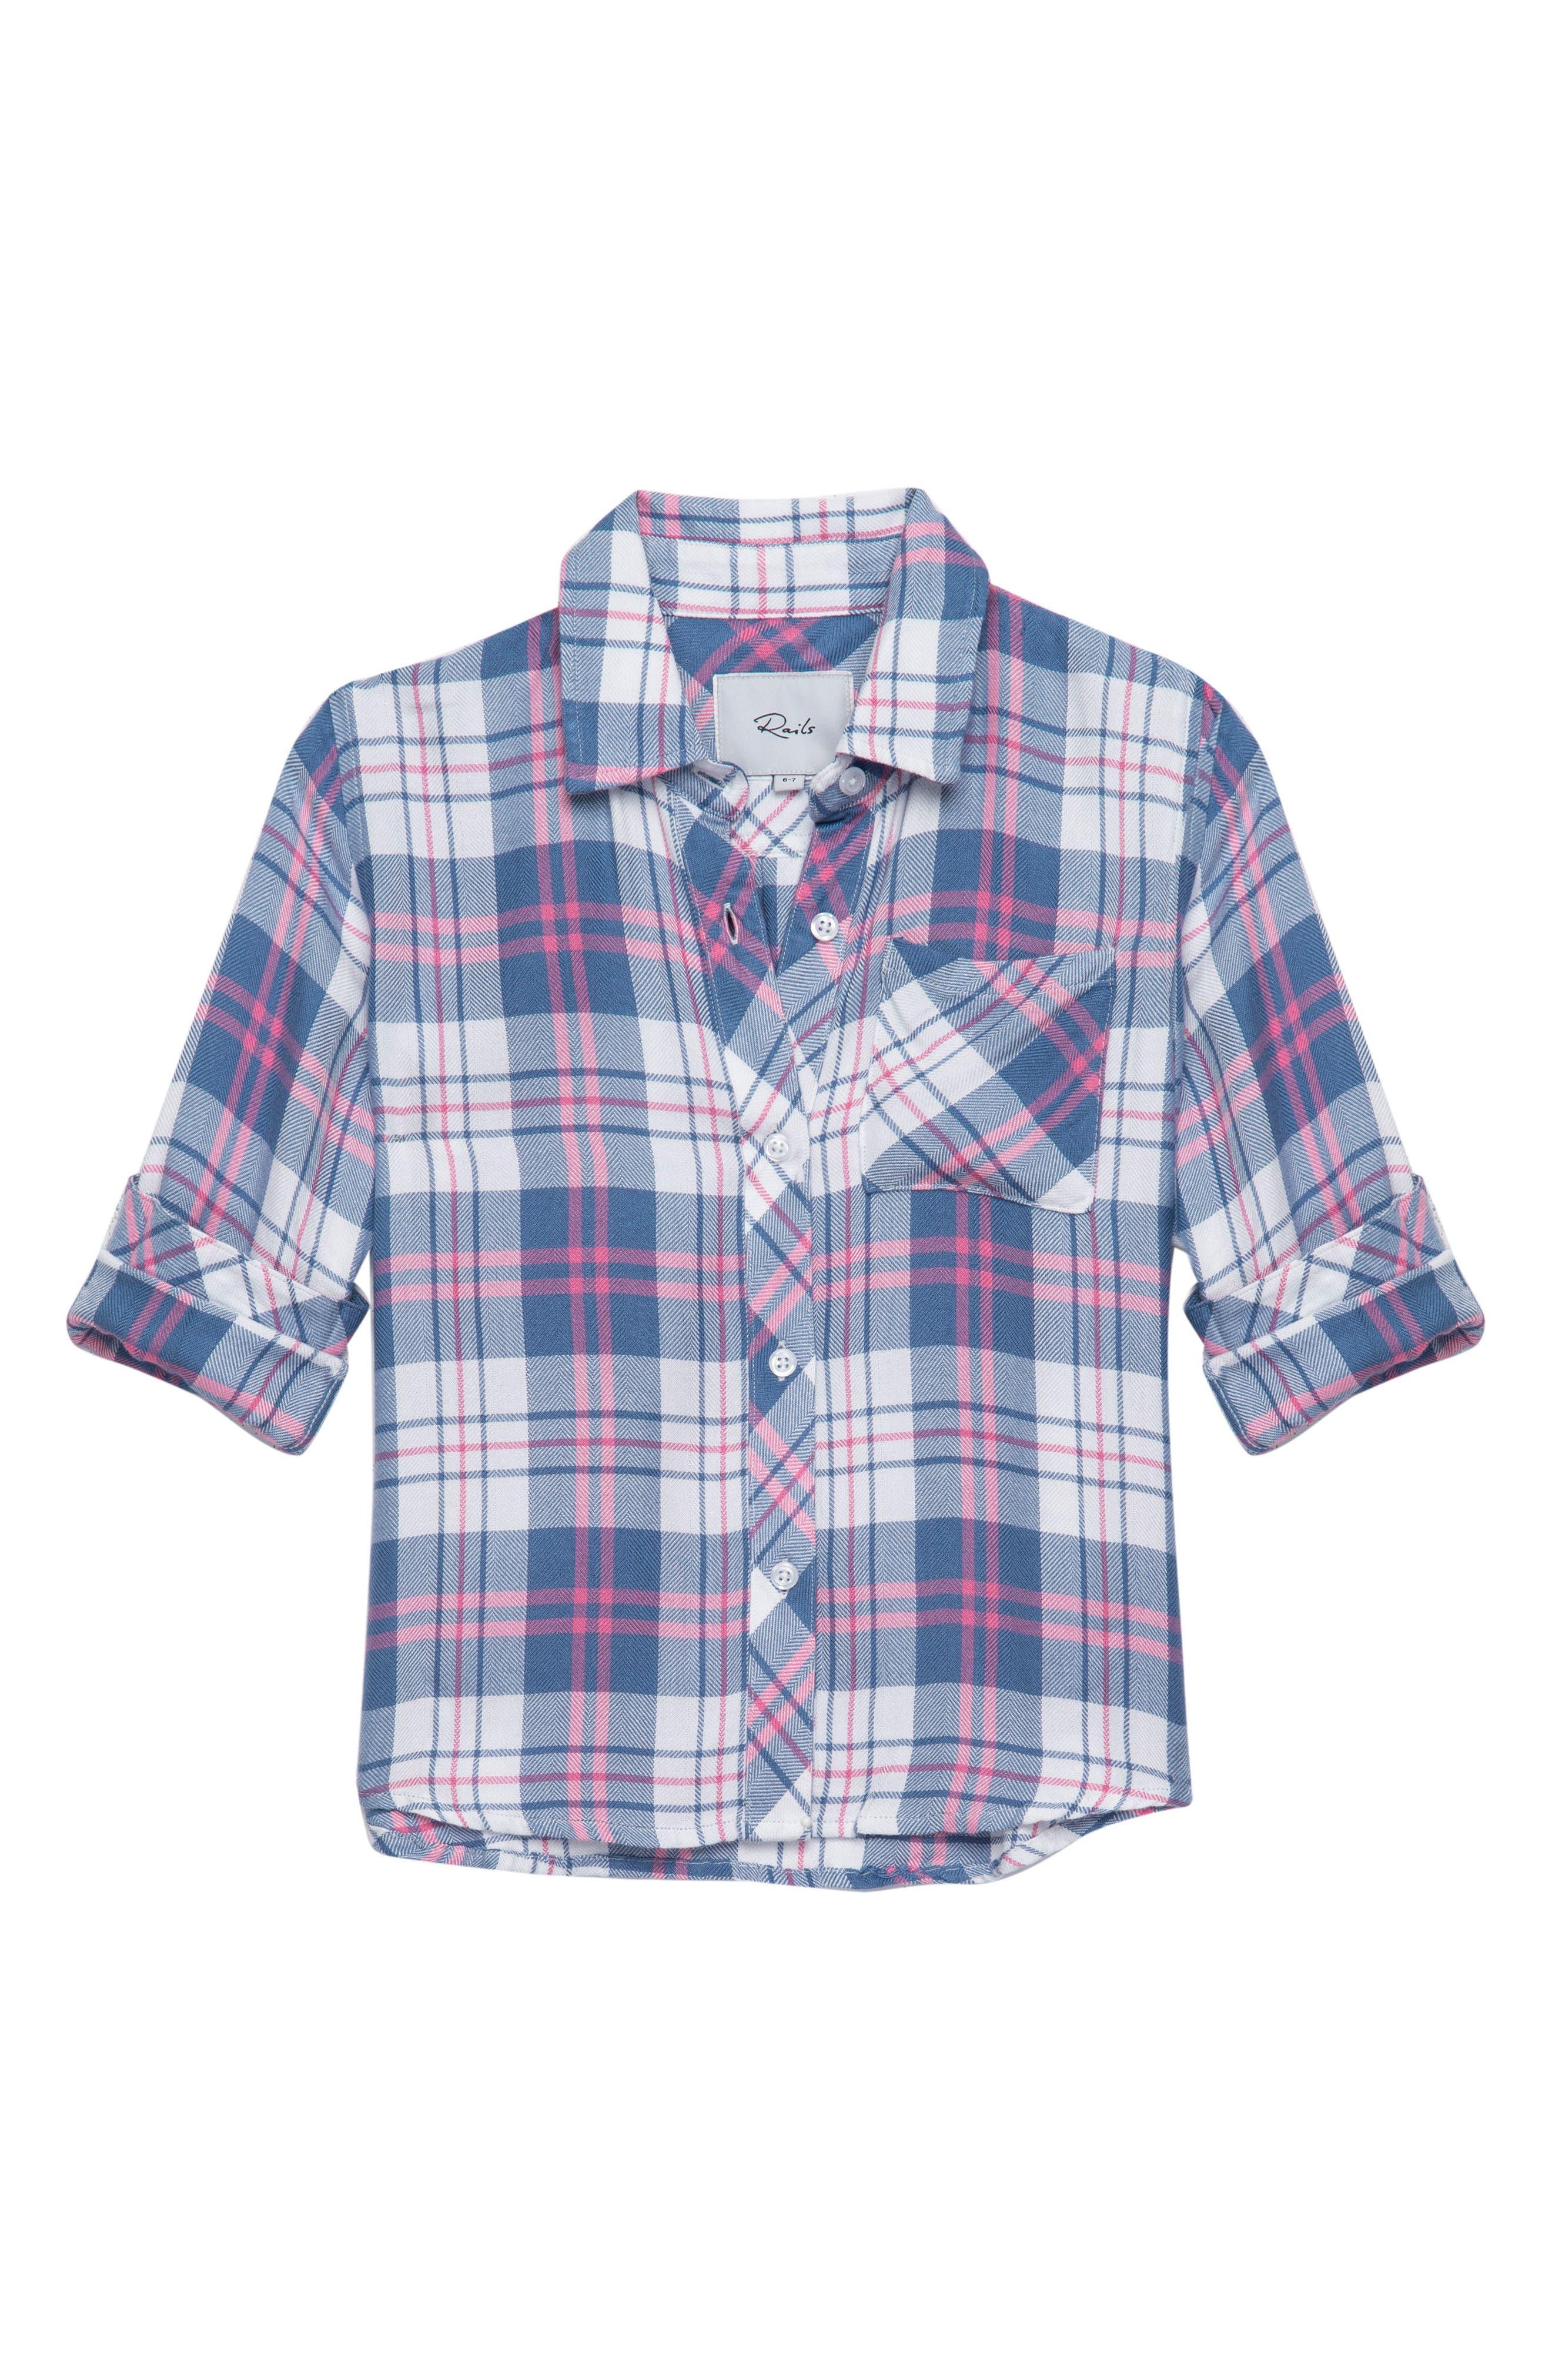 Hudson Plaid Shirt,                         Main,                         color, Watermelon Coast White